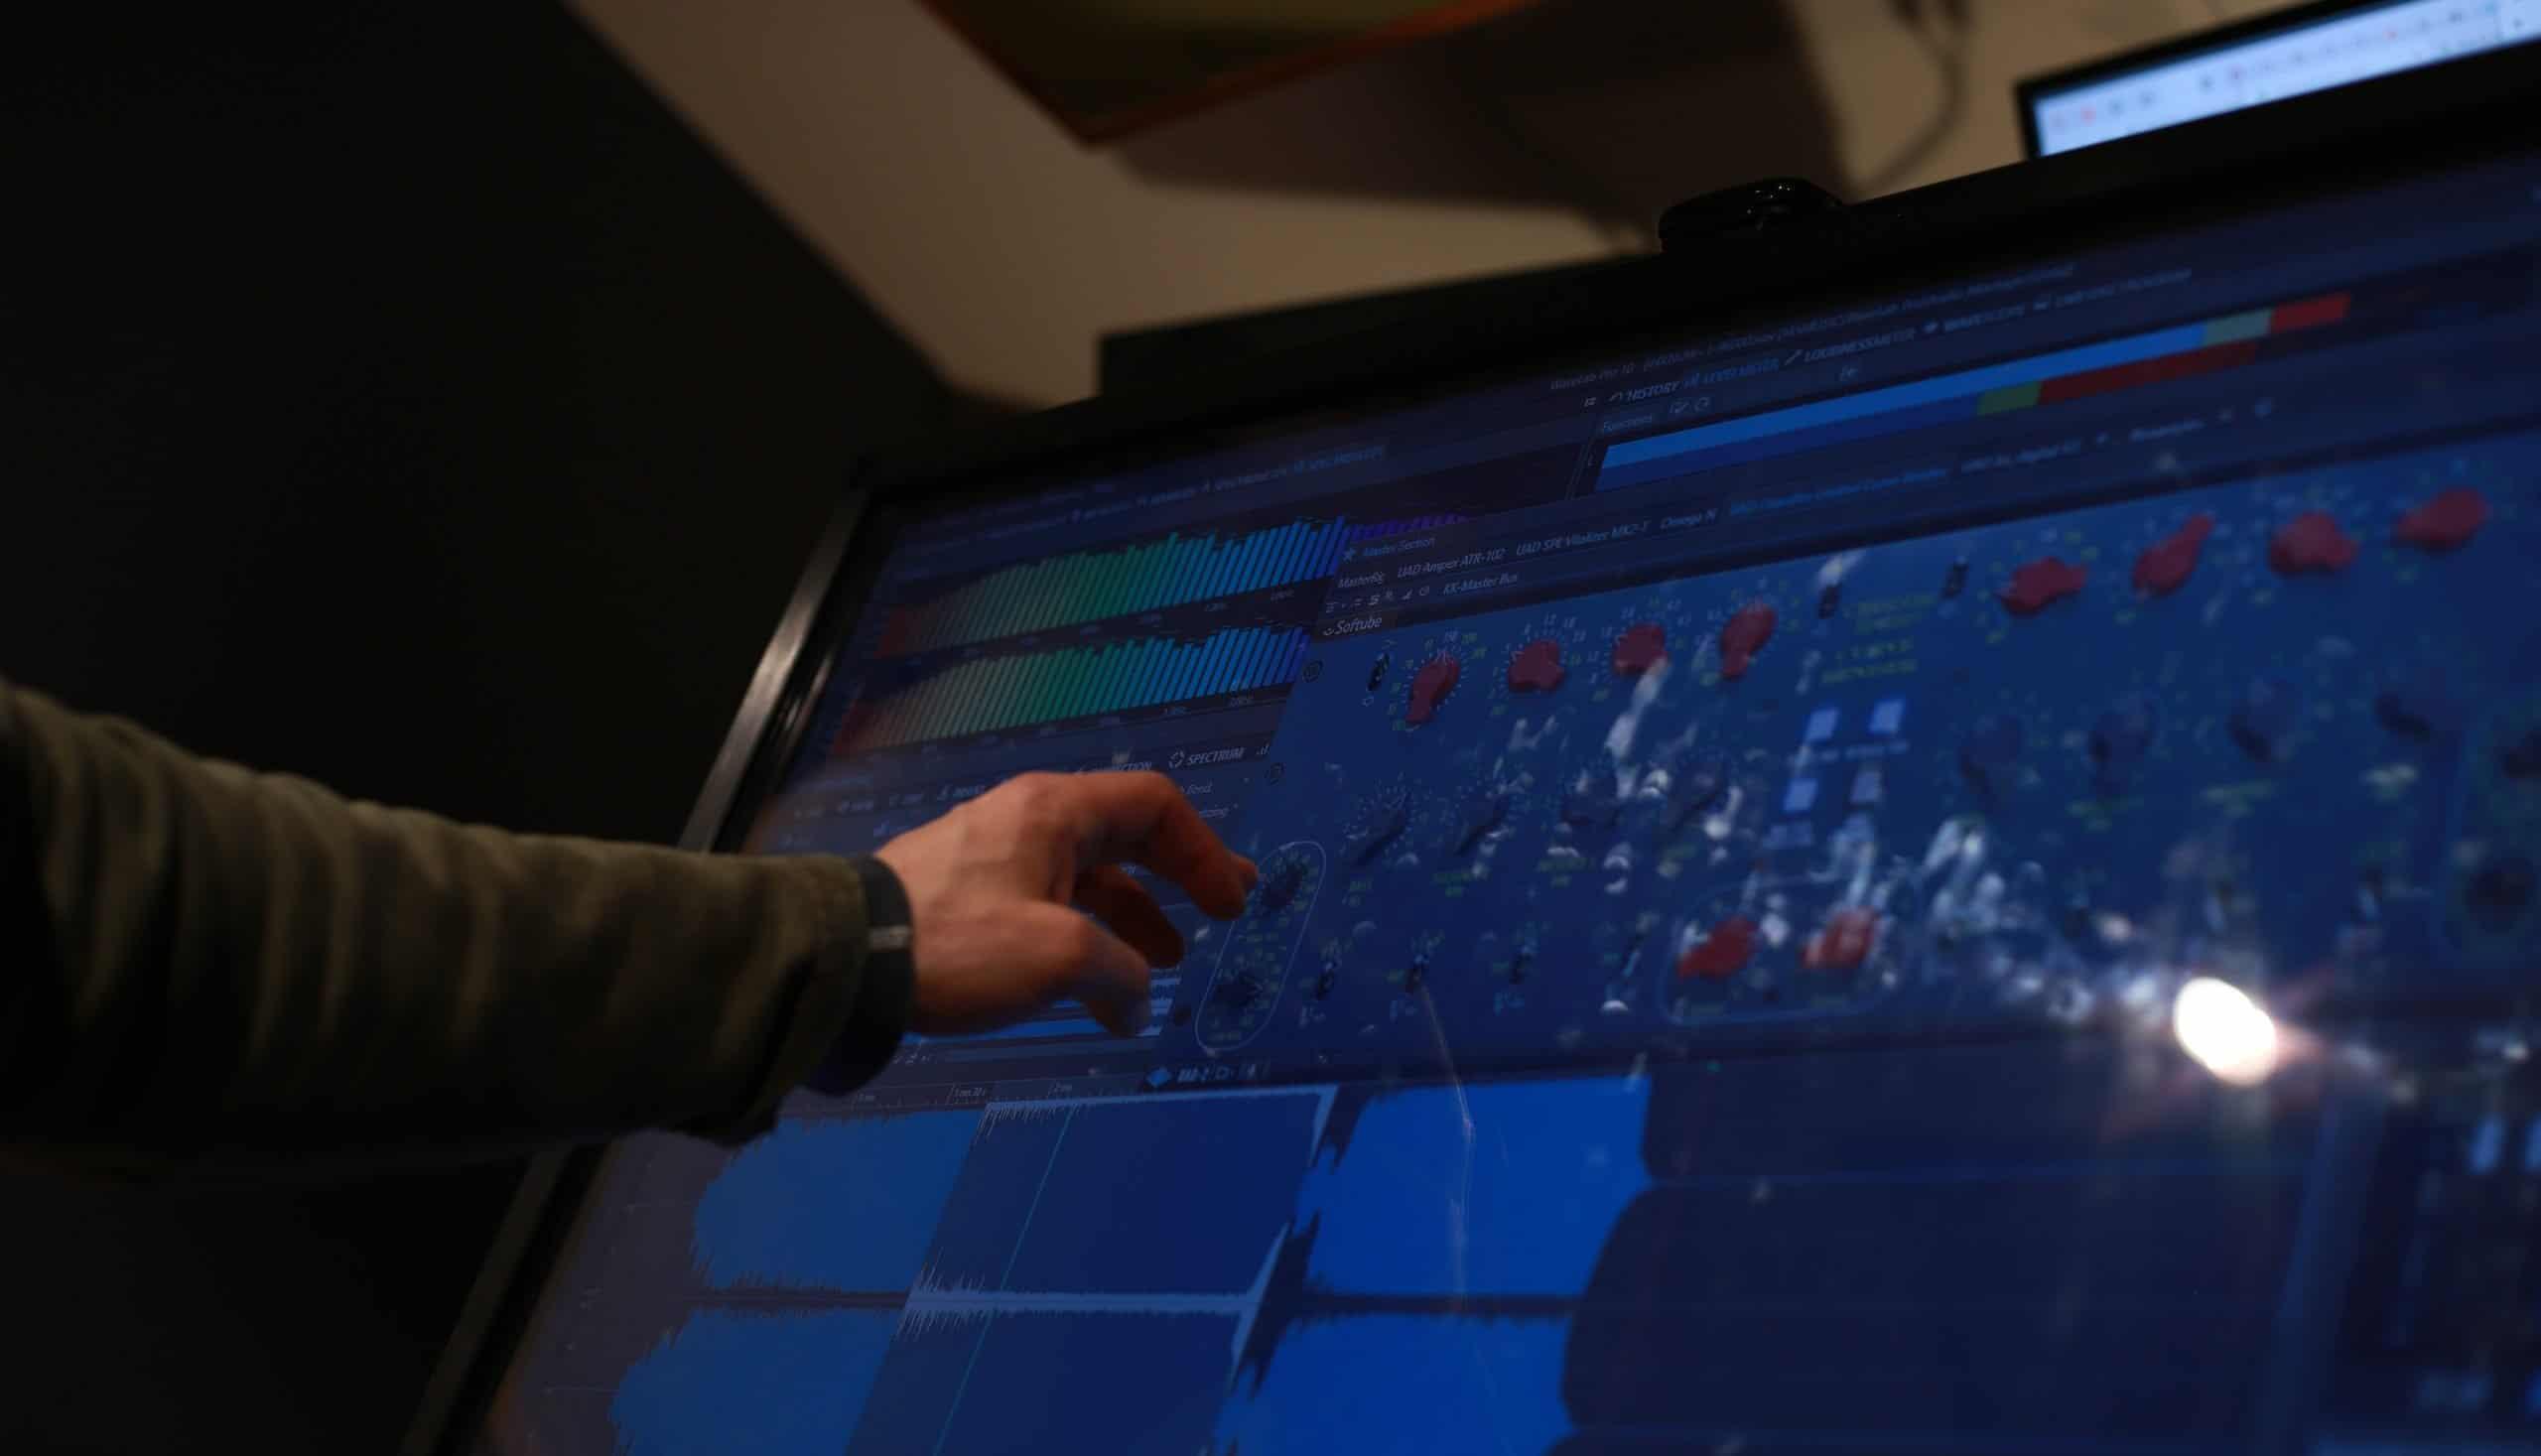 IMG 8037crop scaled 1 - Stellar Sound Labs Music Mastering